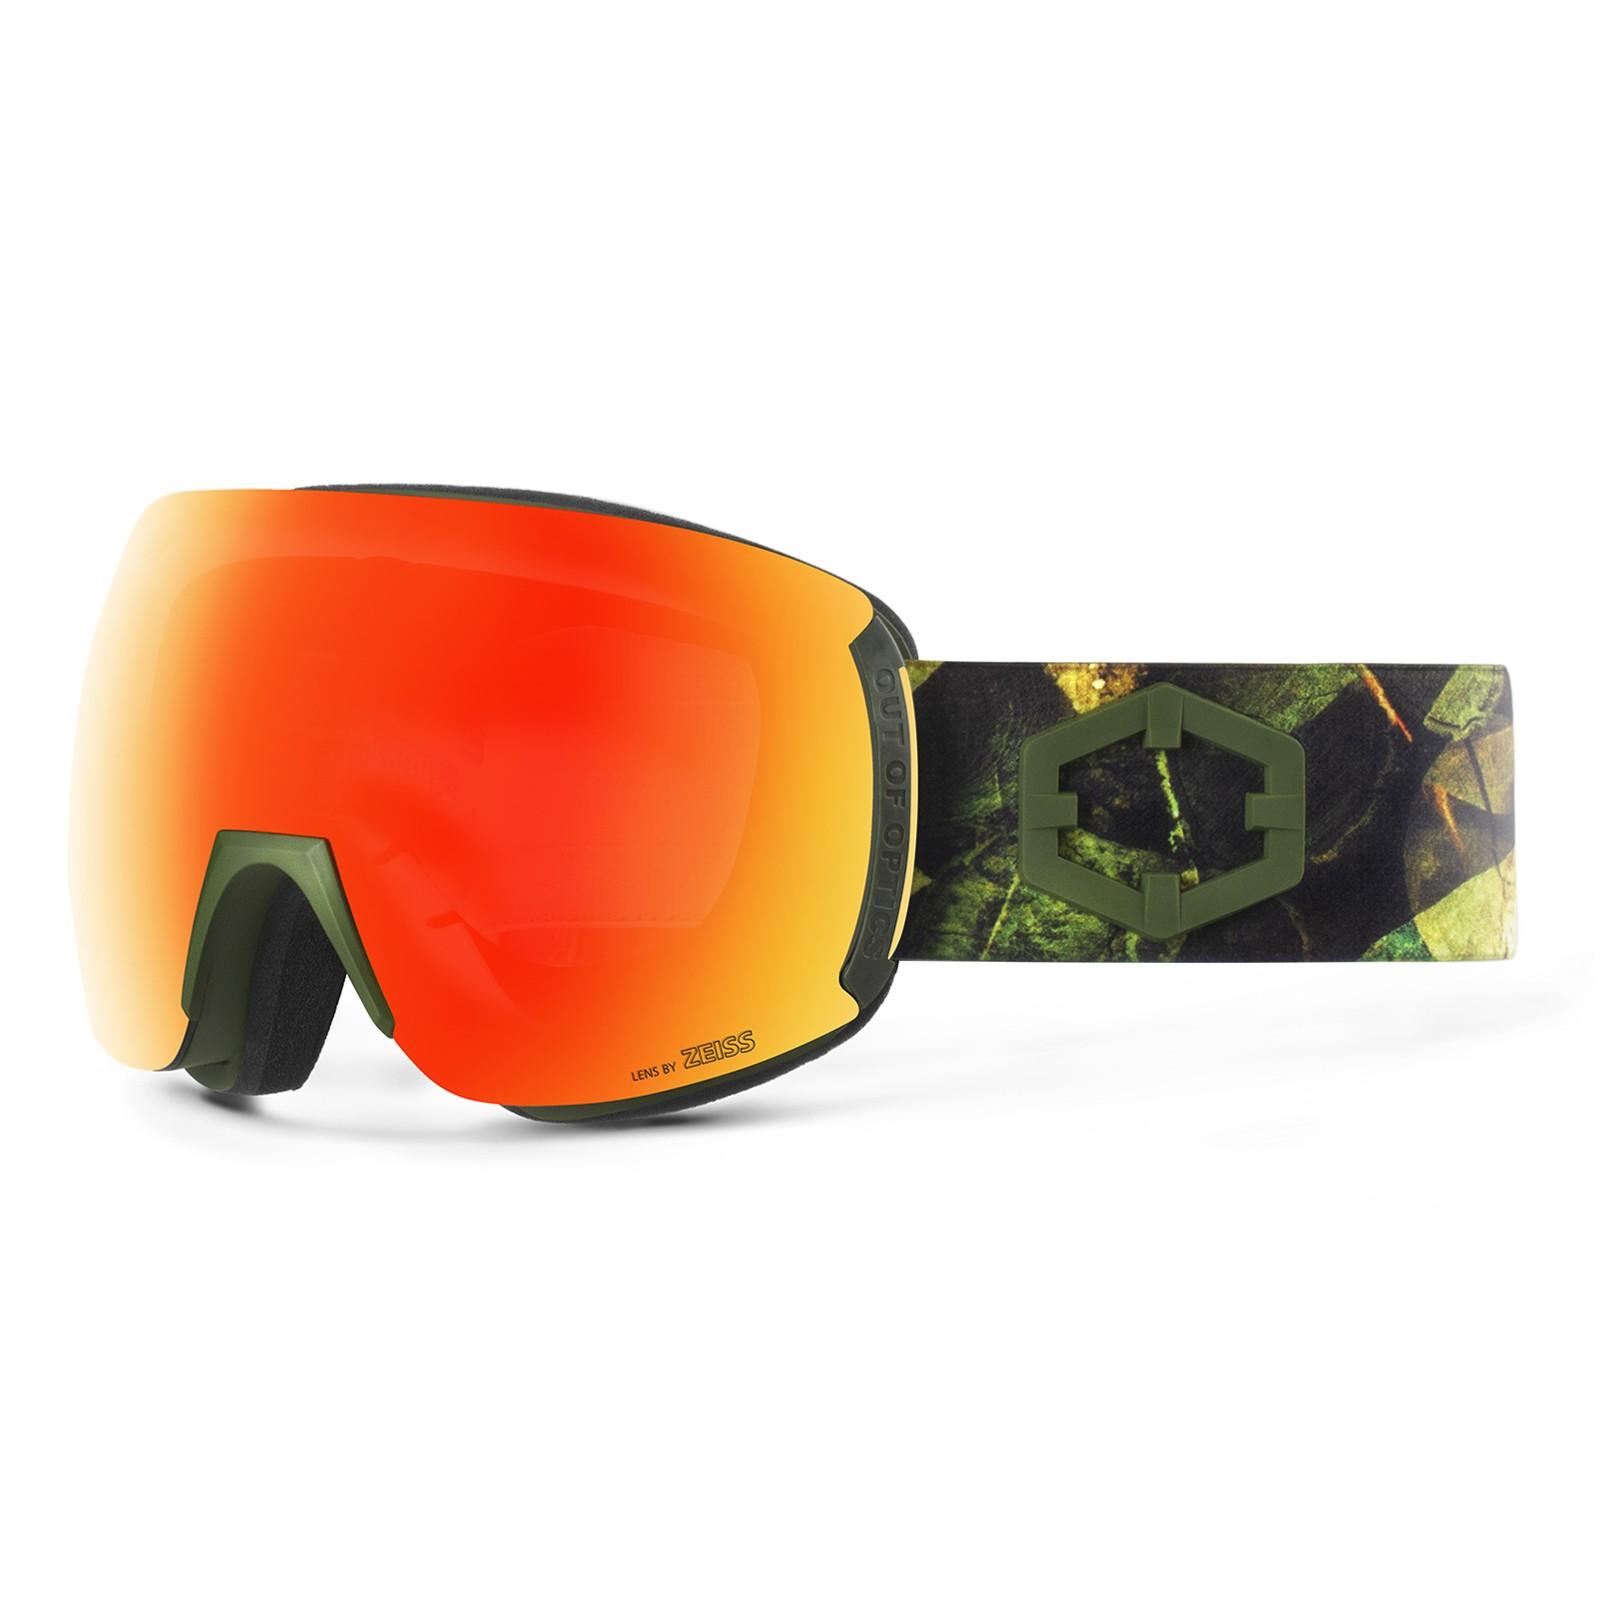 Earth Evergreen Red mci goggle